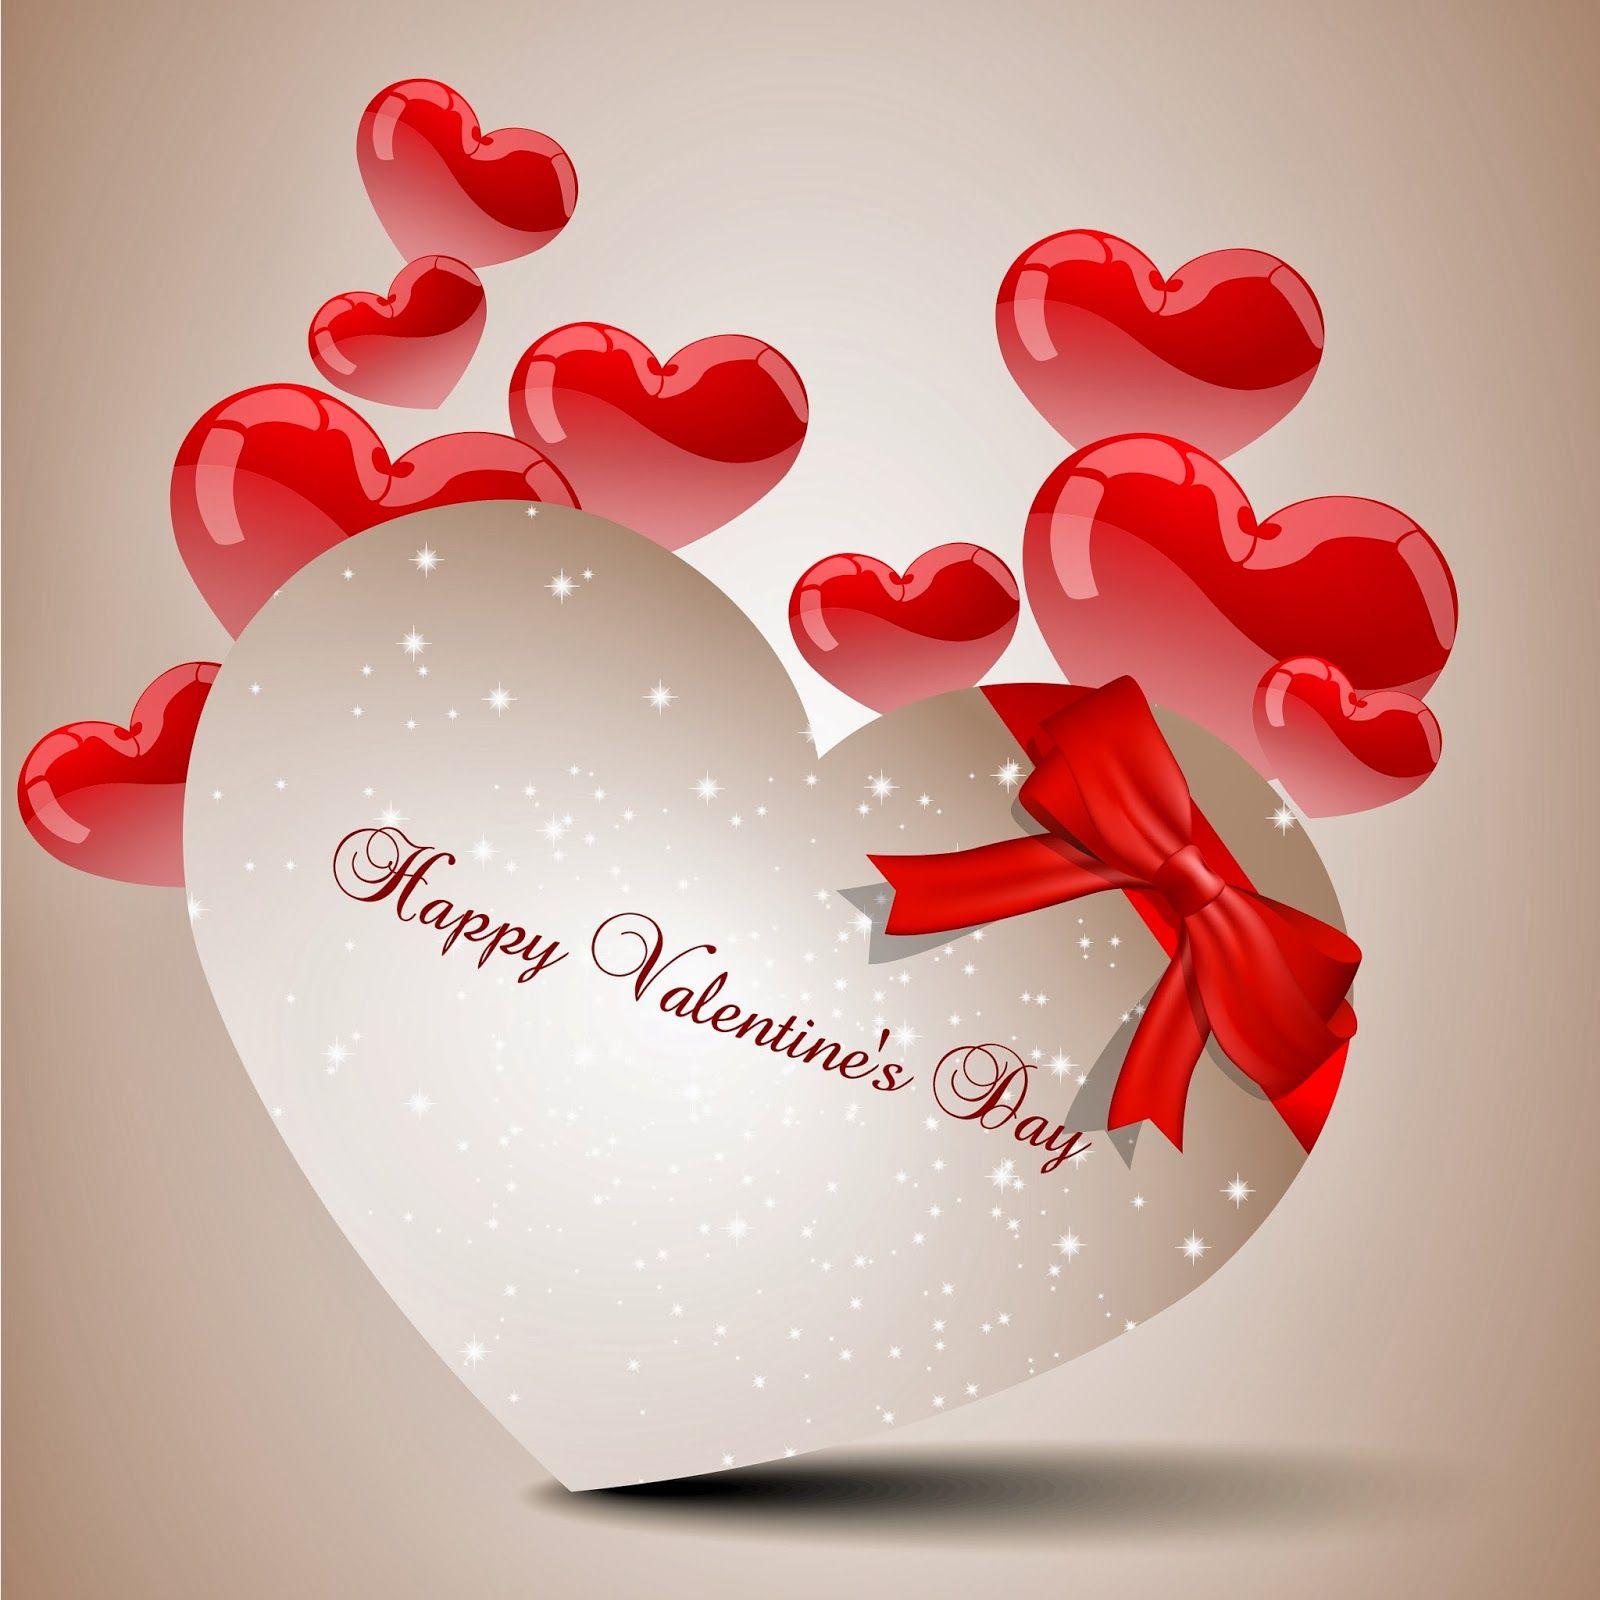 ♥✿ happy valentine's day ✿♥ | ❤️happy valentine day